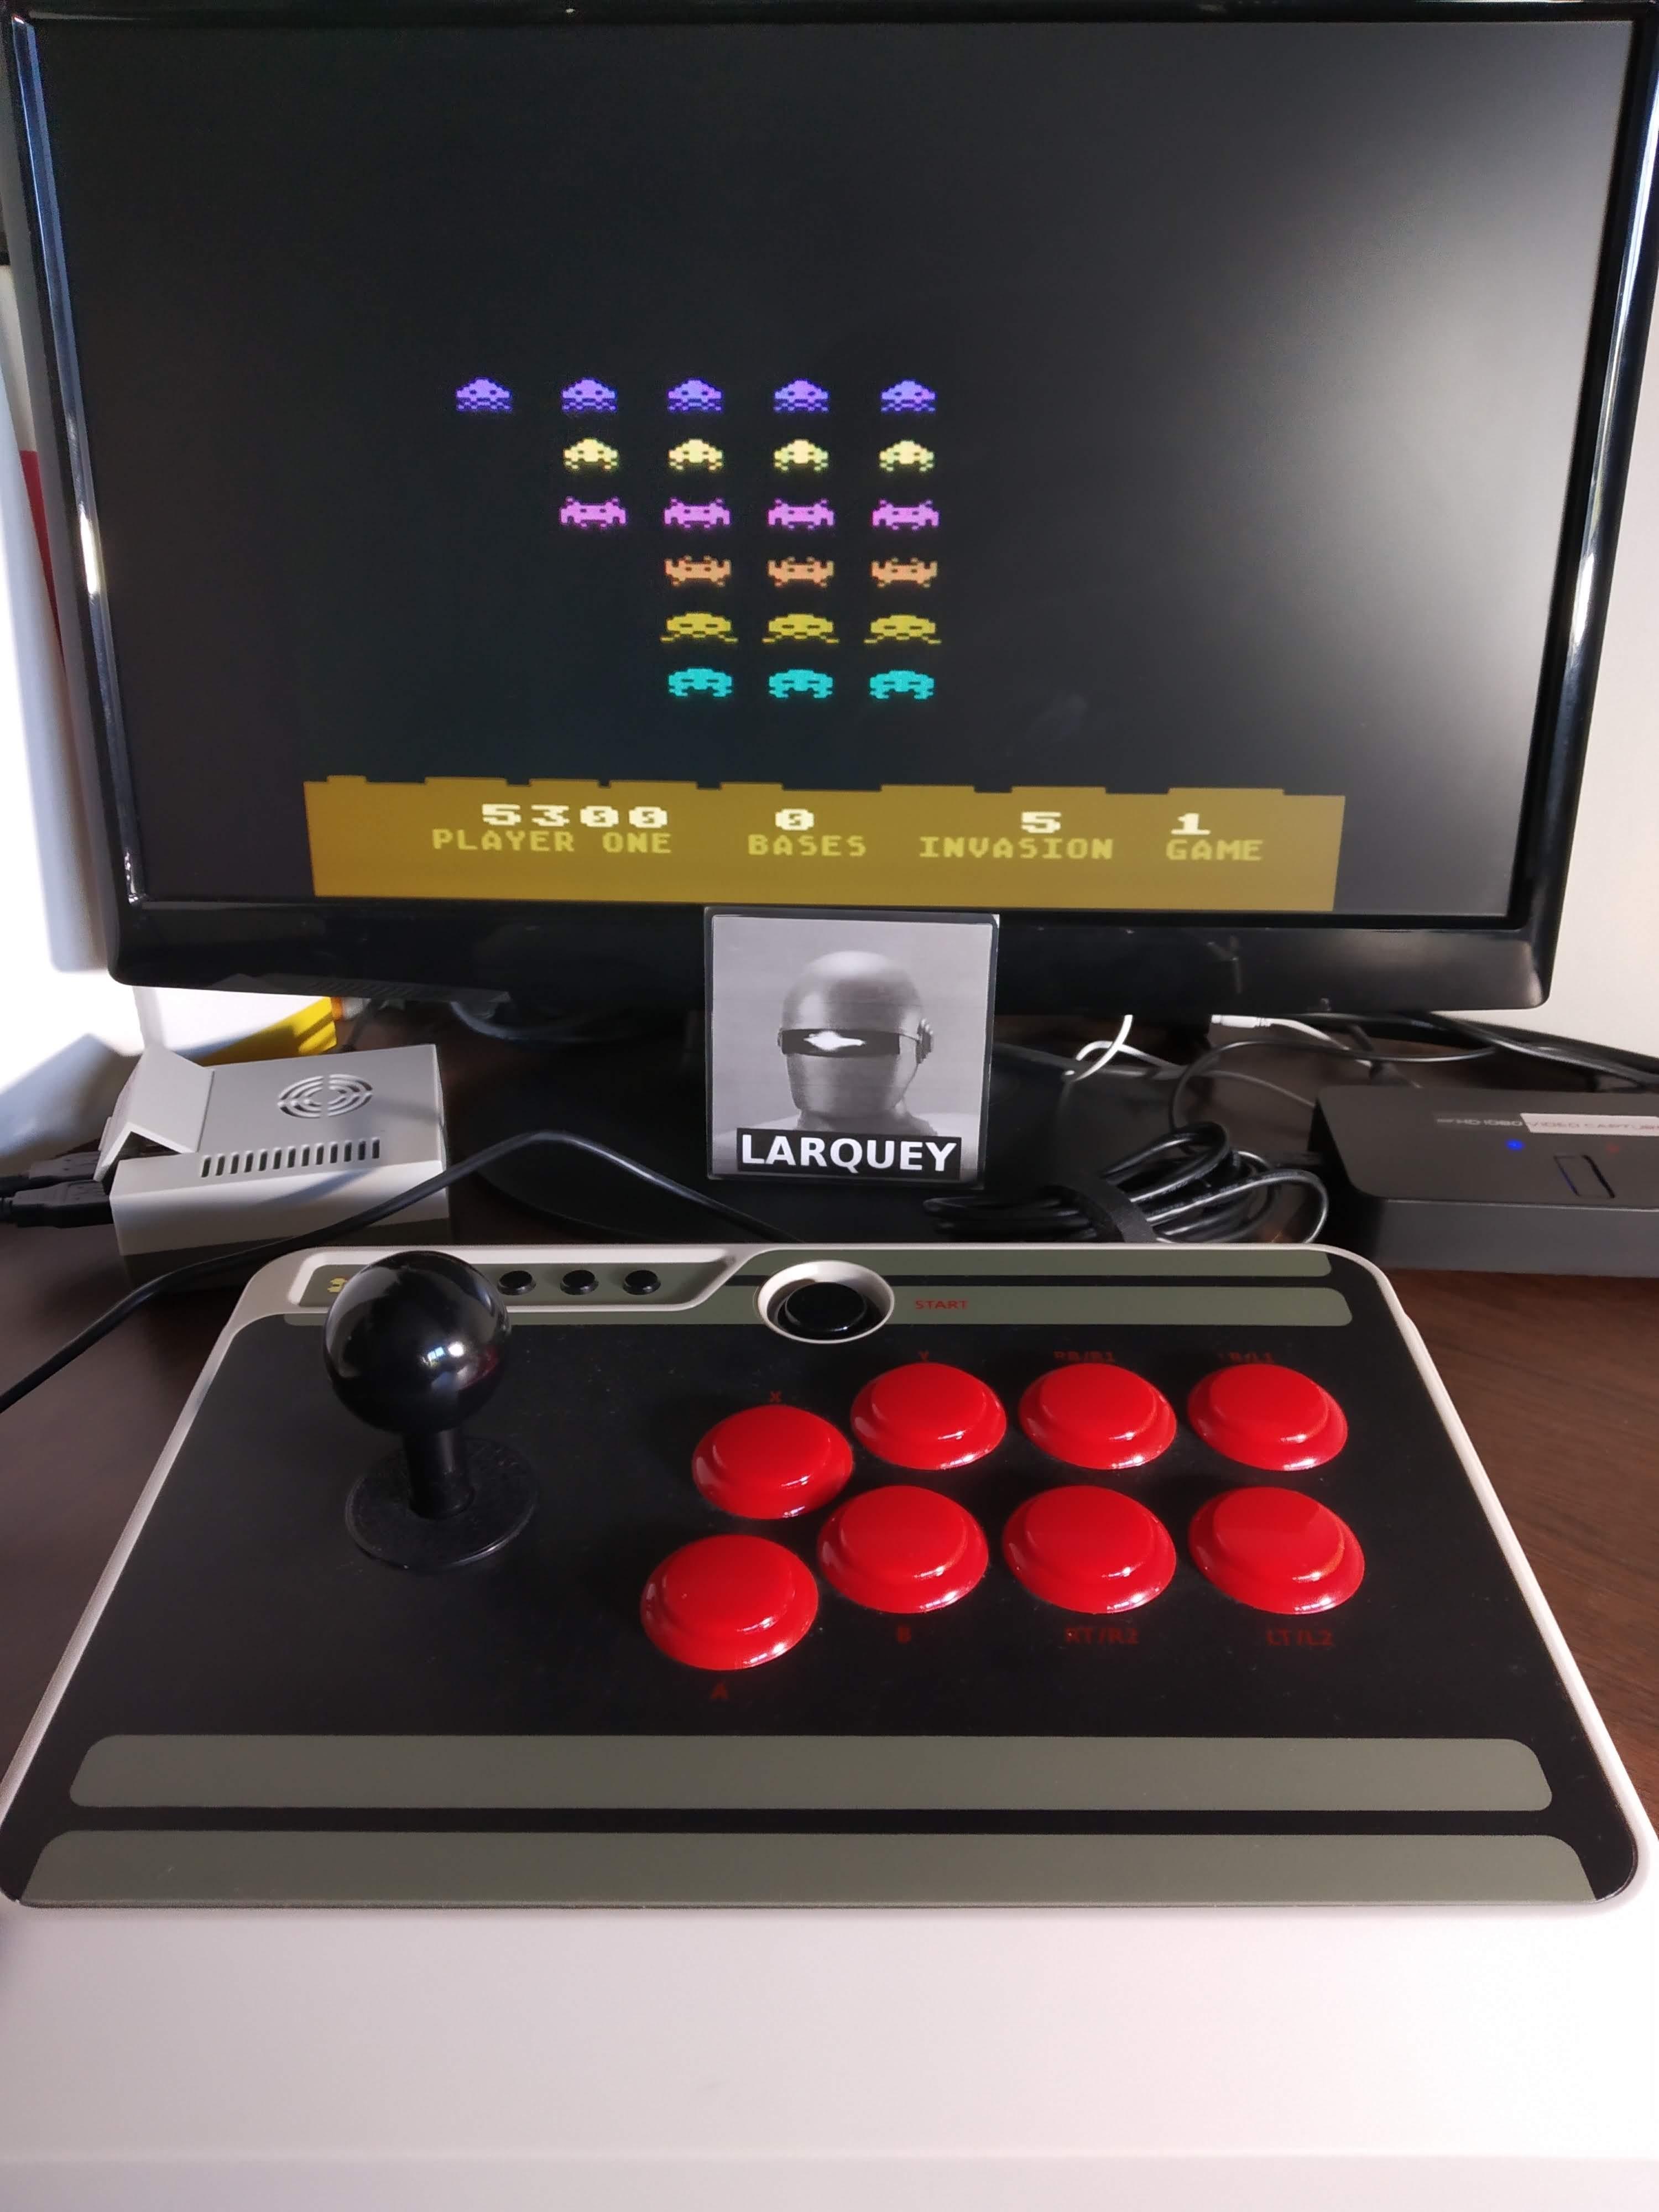 Larquey: Atari Invaders (Atari 400/800/XL/XE Emulated) 5,300 points on 2019-11-24 12:07:02